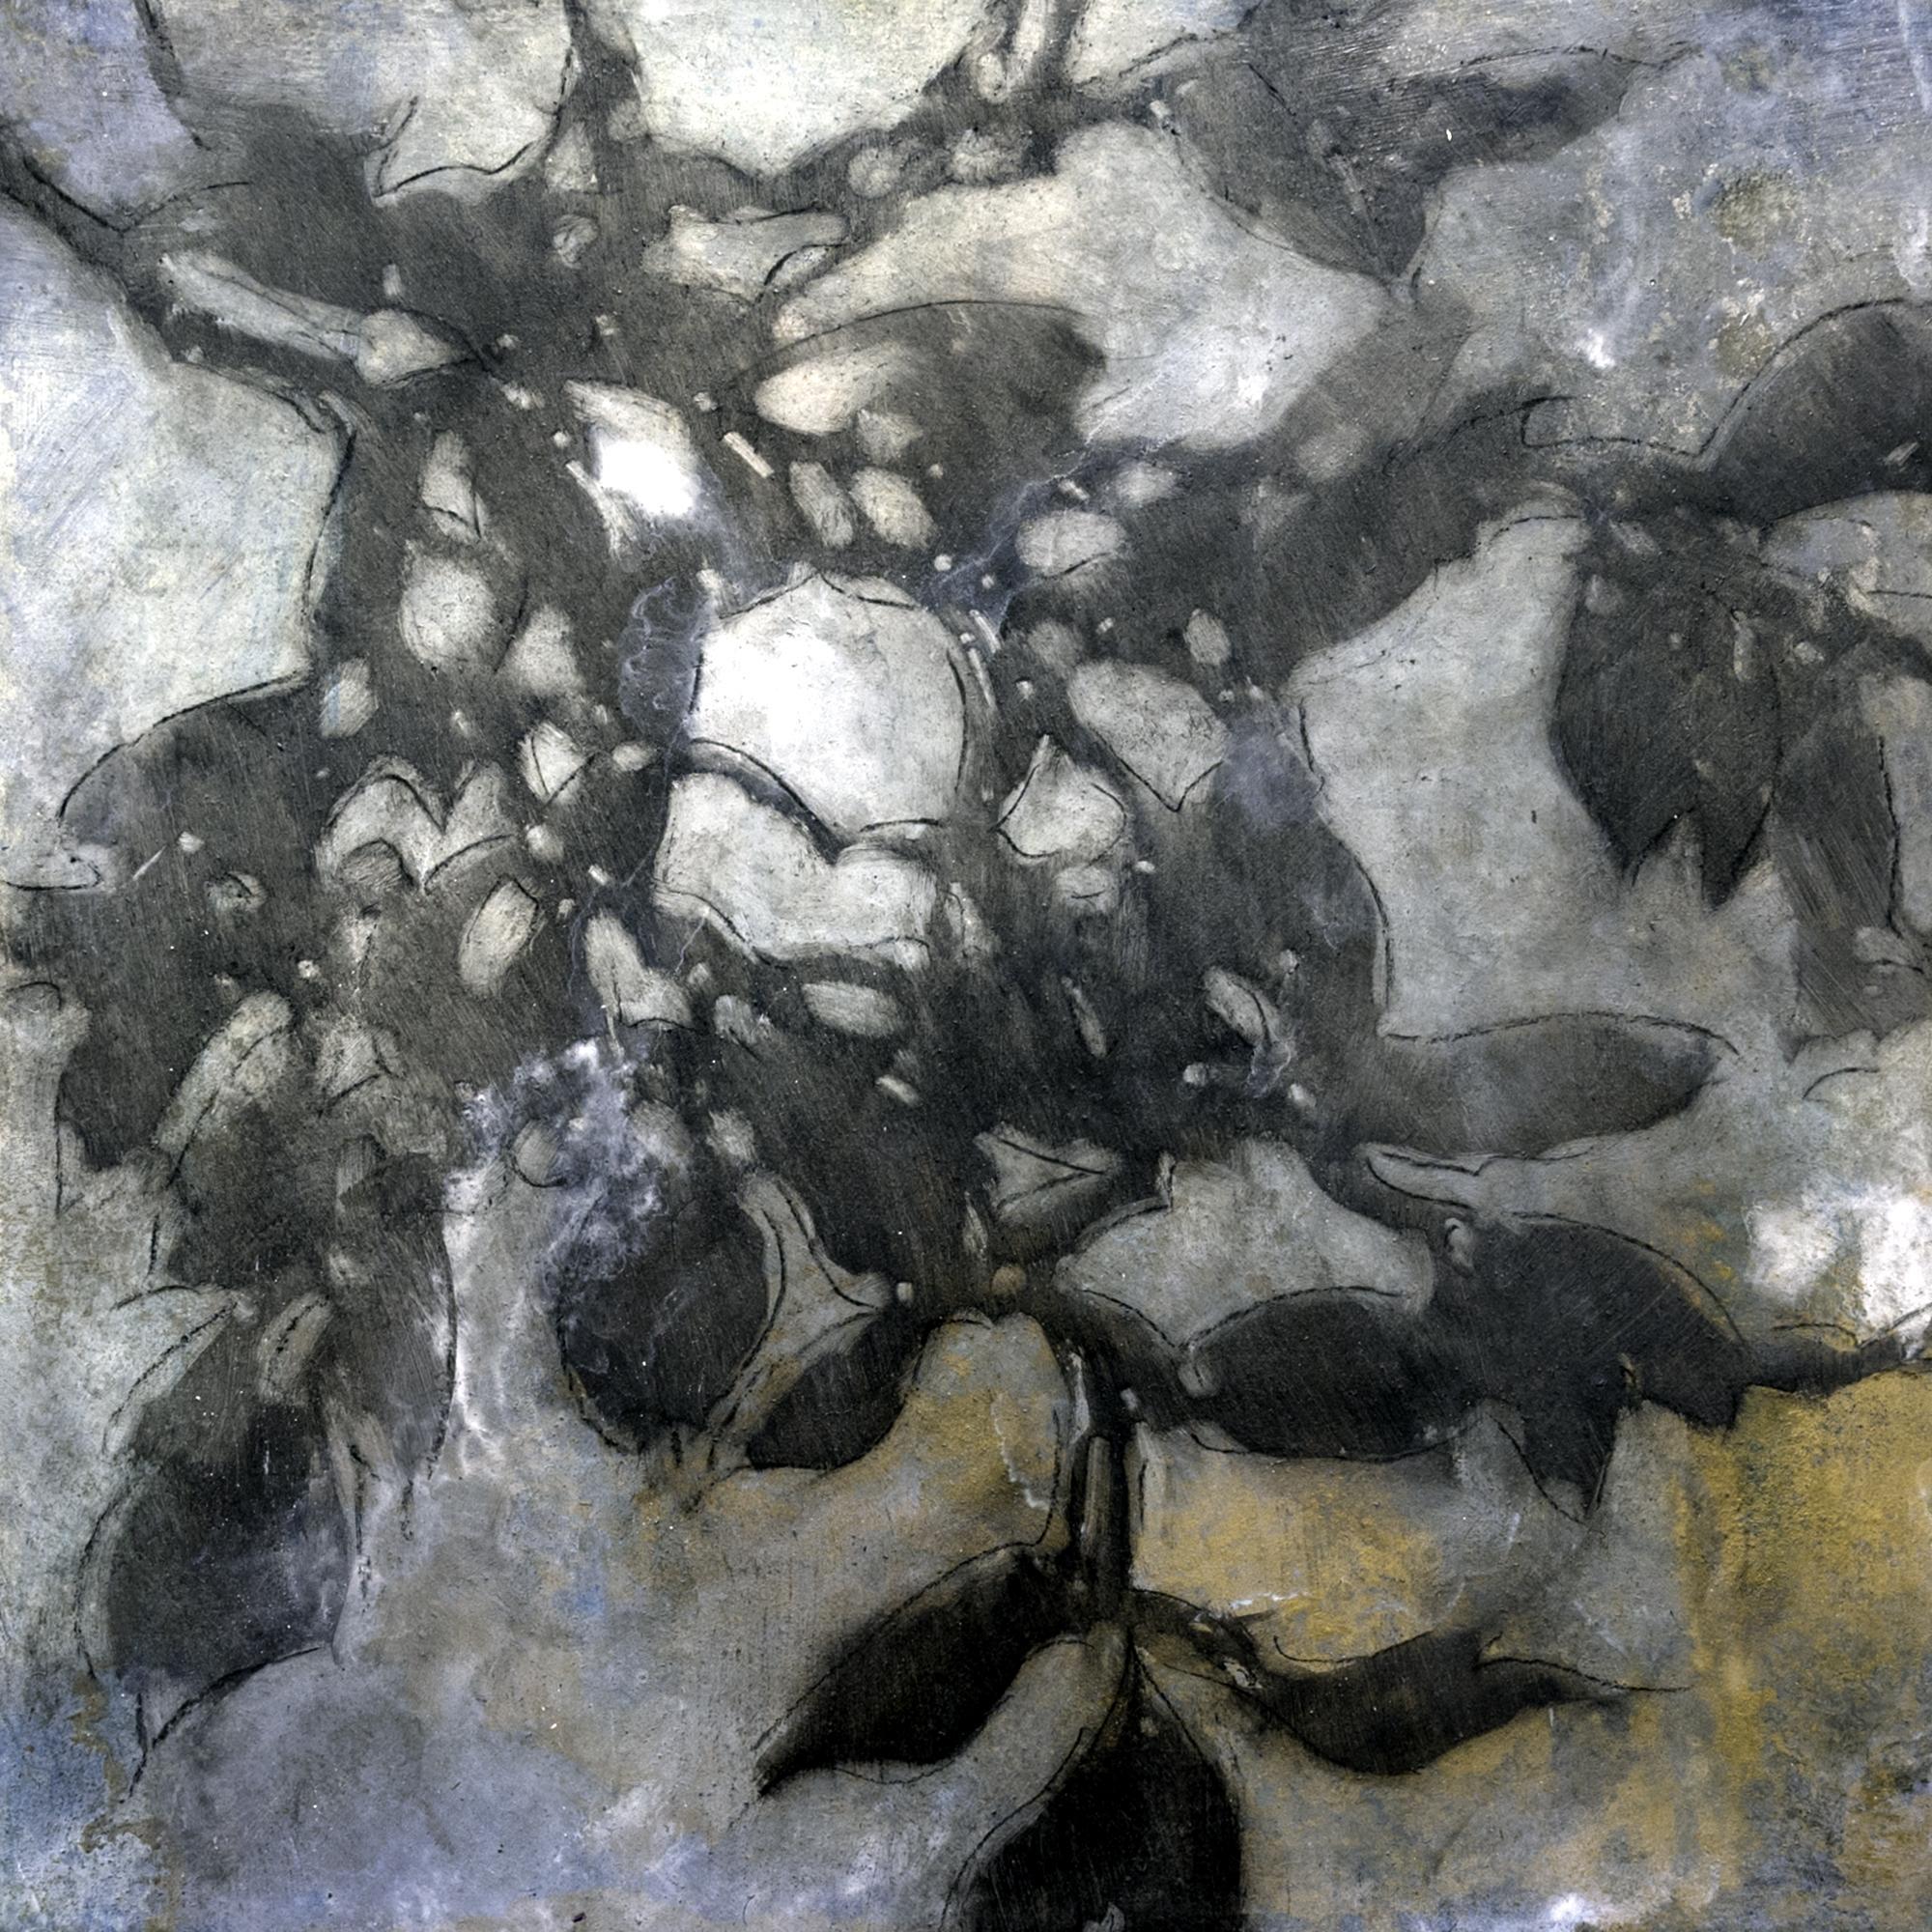 Nebular Vines 9432, Botanical, Nature,  Silver, Brown, Leaves, Nature Inspired